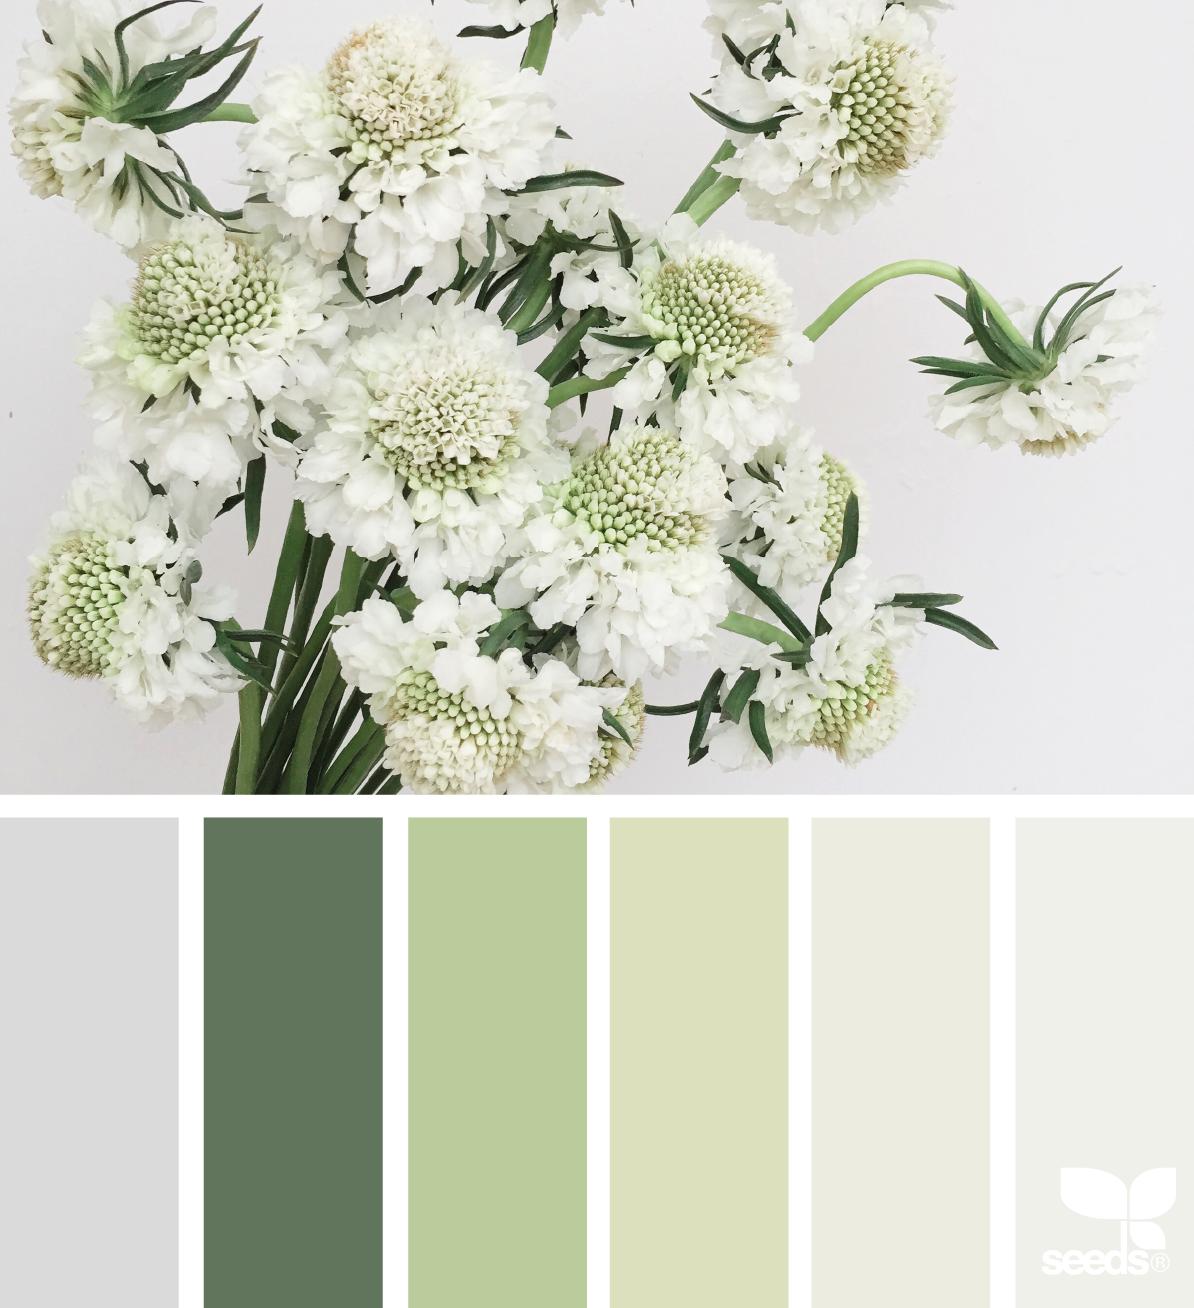 Flora tones farben pinterest - Farbkombinationen wandfarbe ...